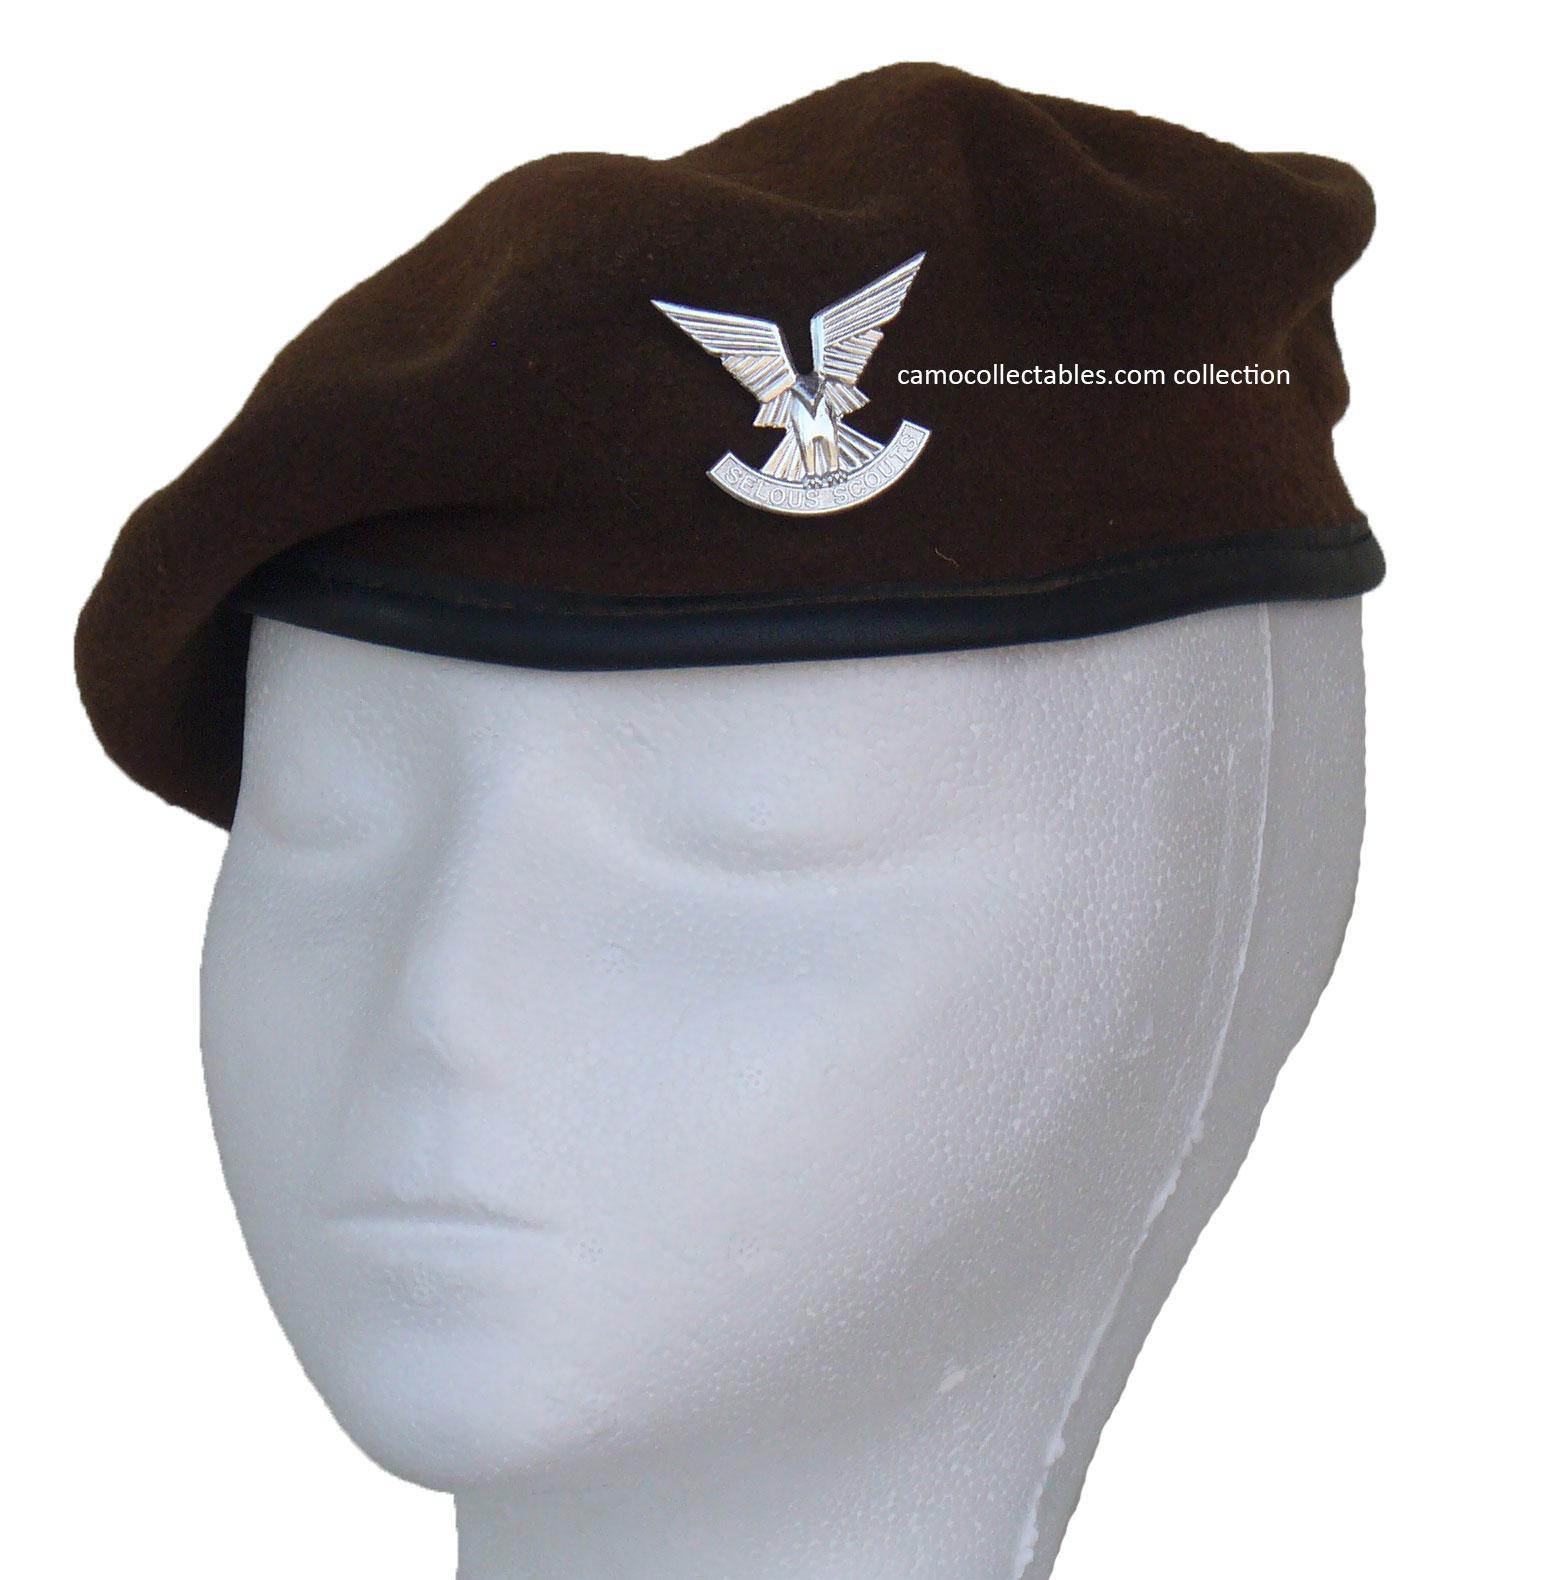 Camo Collectables. Rhodesian Selous Scouts Beret